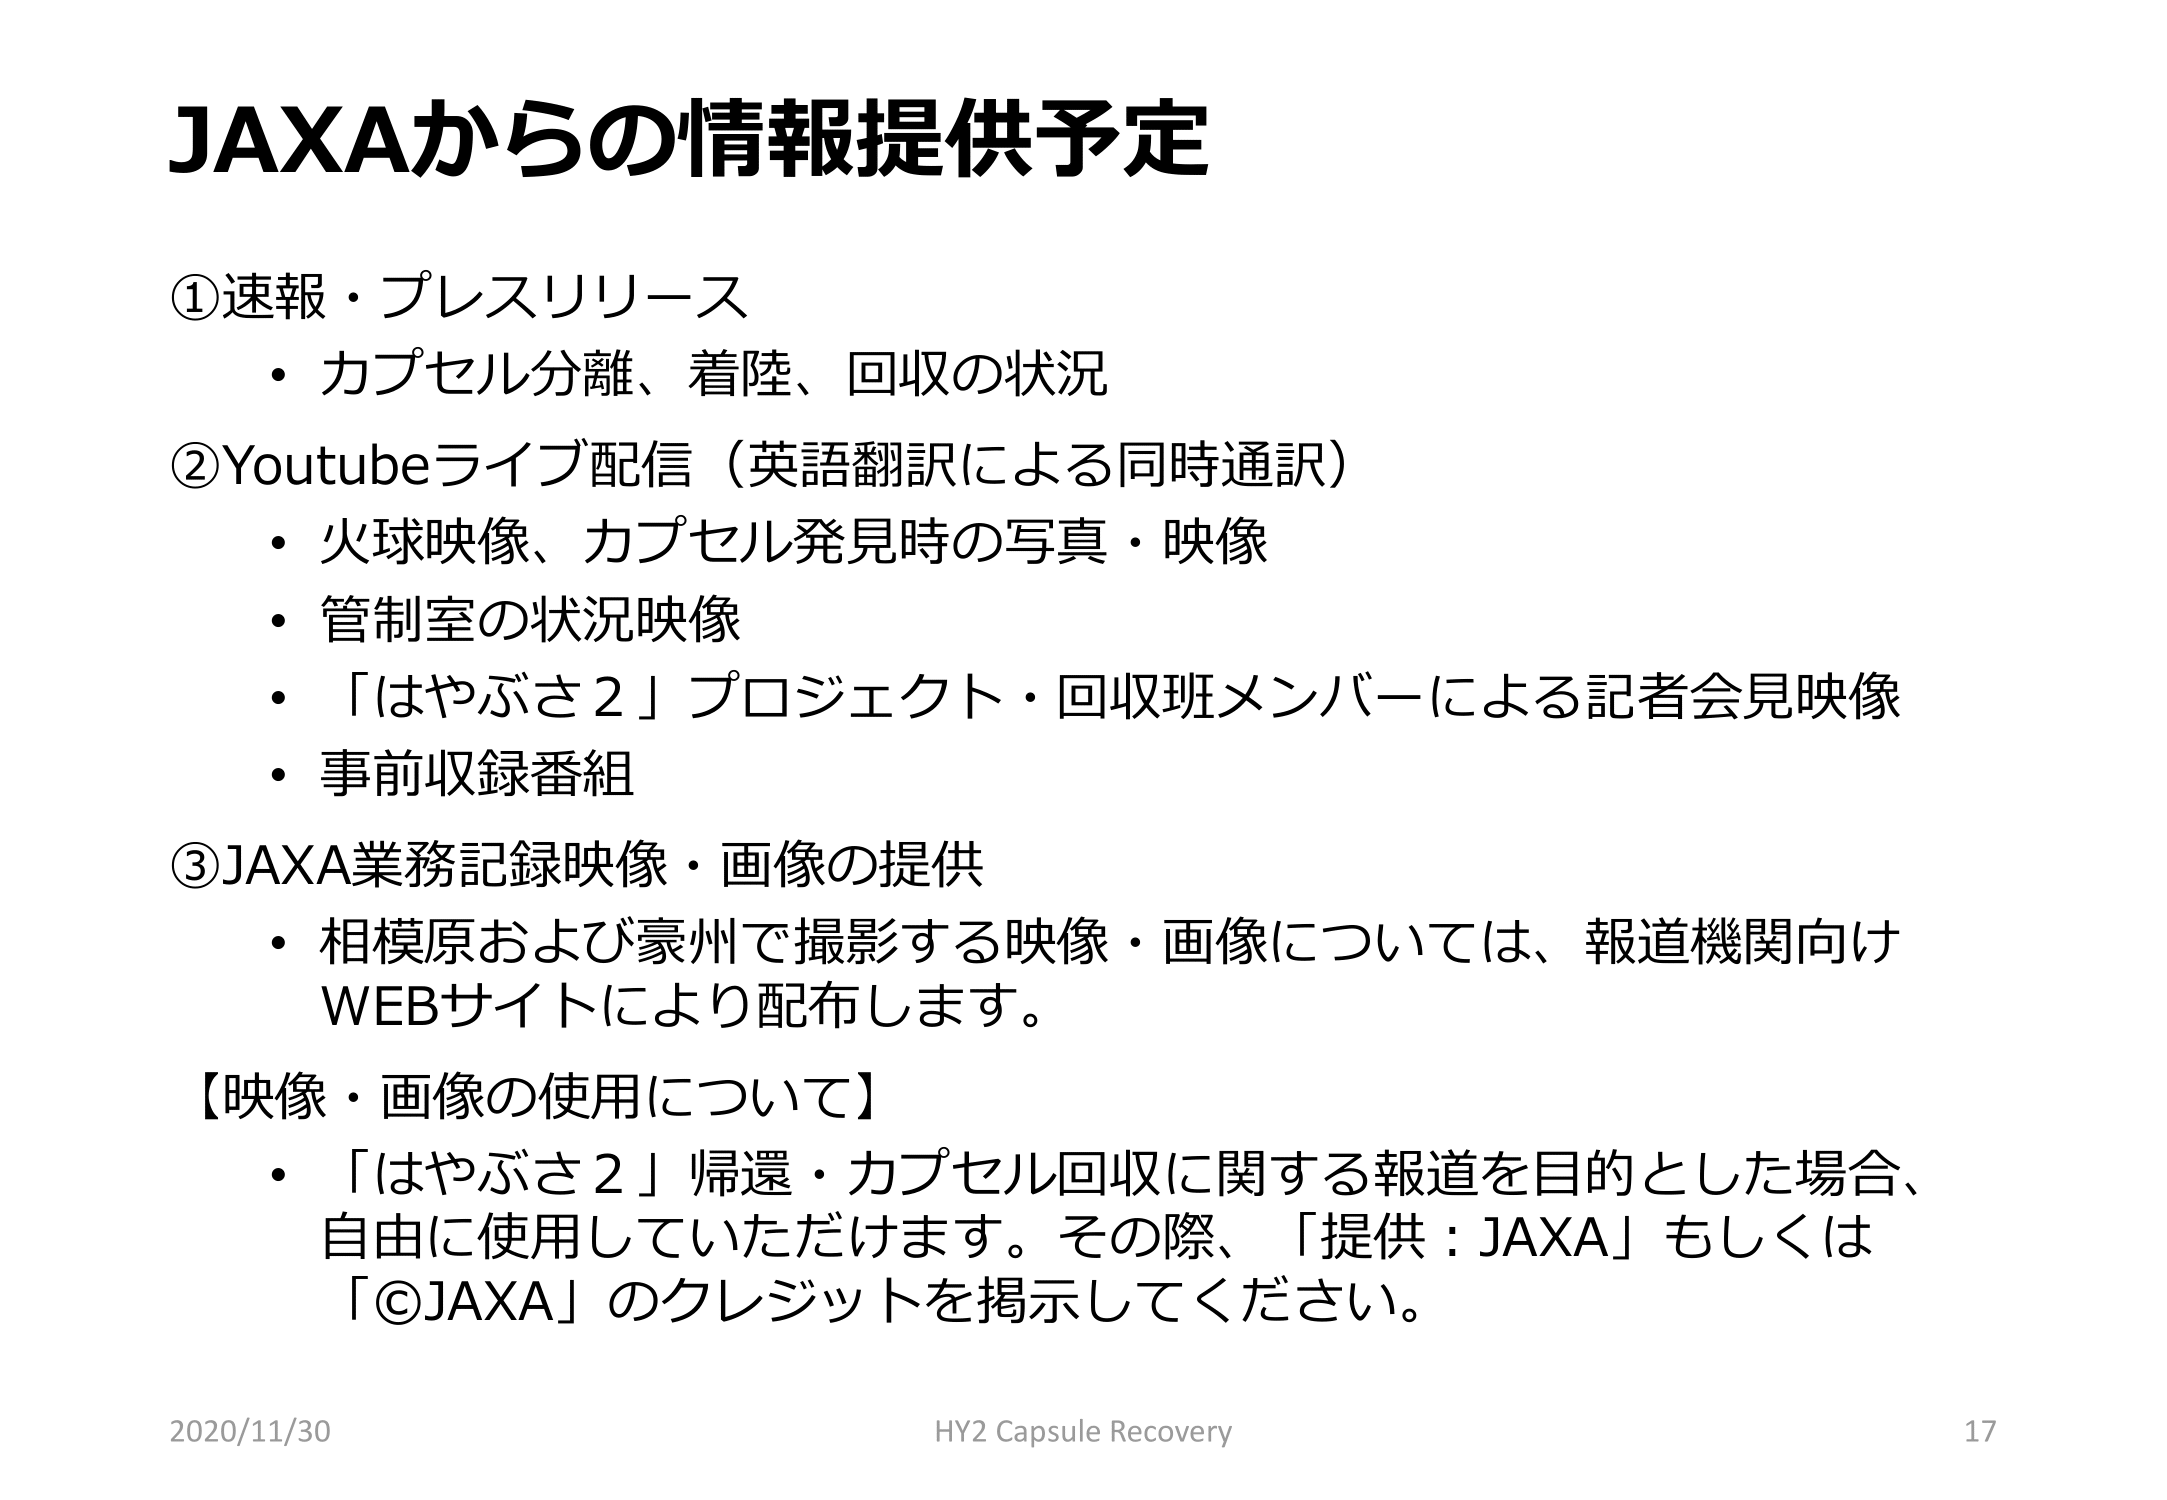 f:id:Imamura:20201130154508p:plain:h250